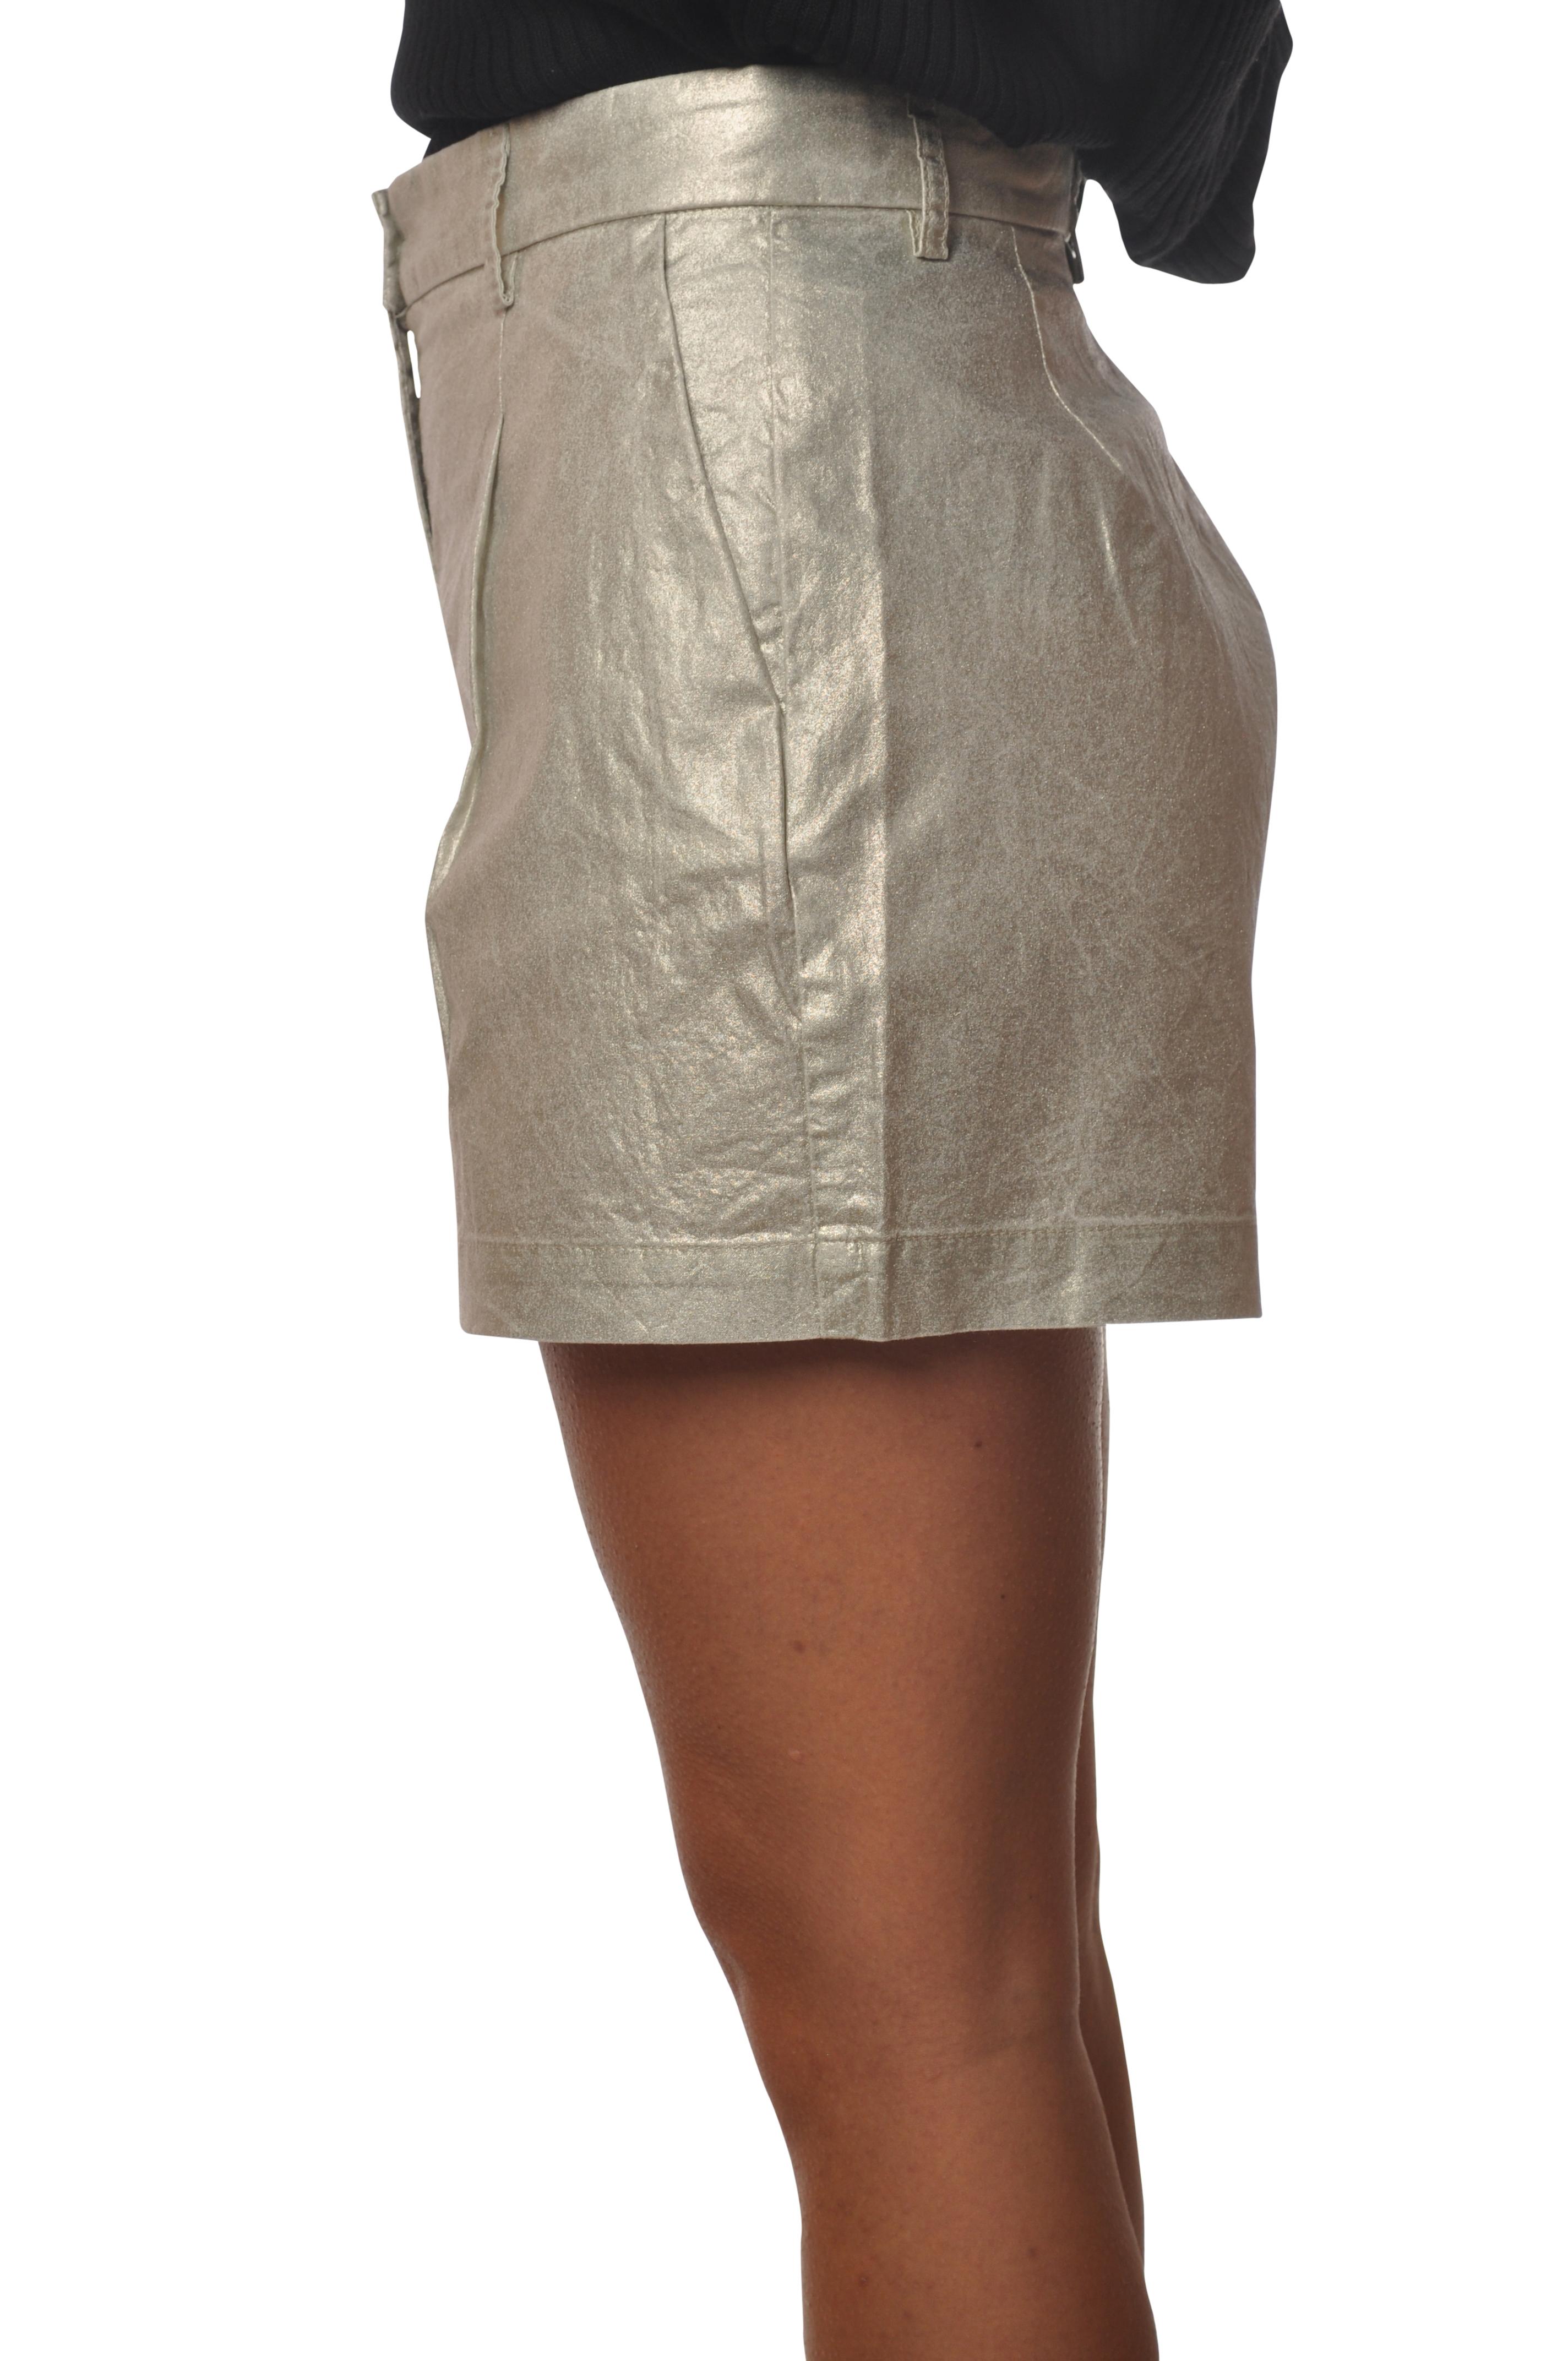 8pm - Shorts